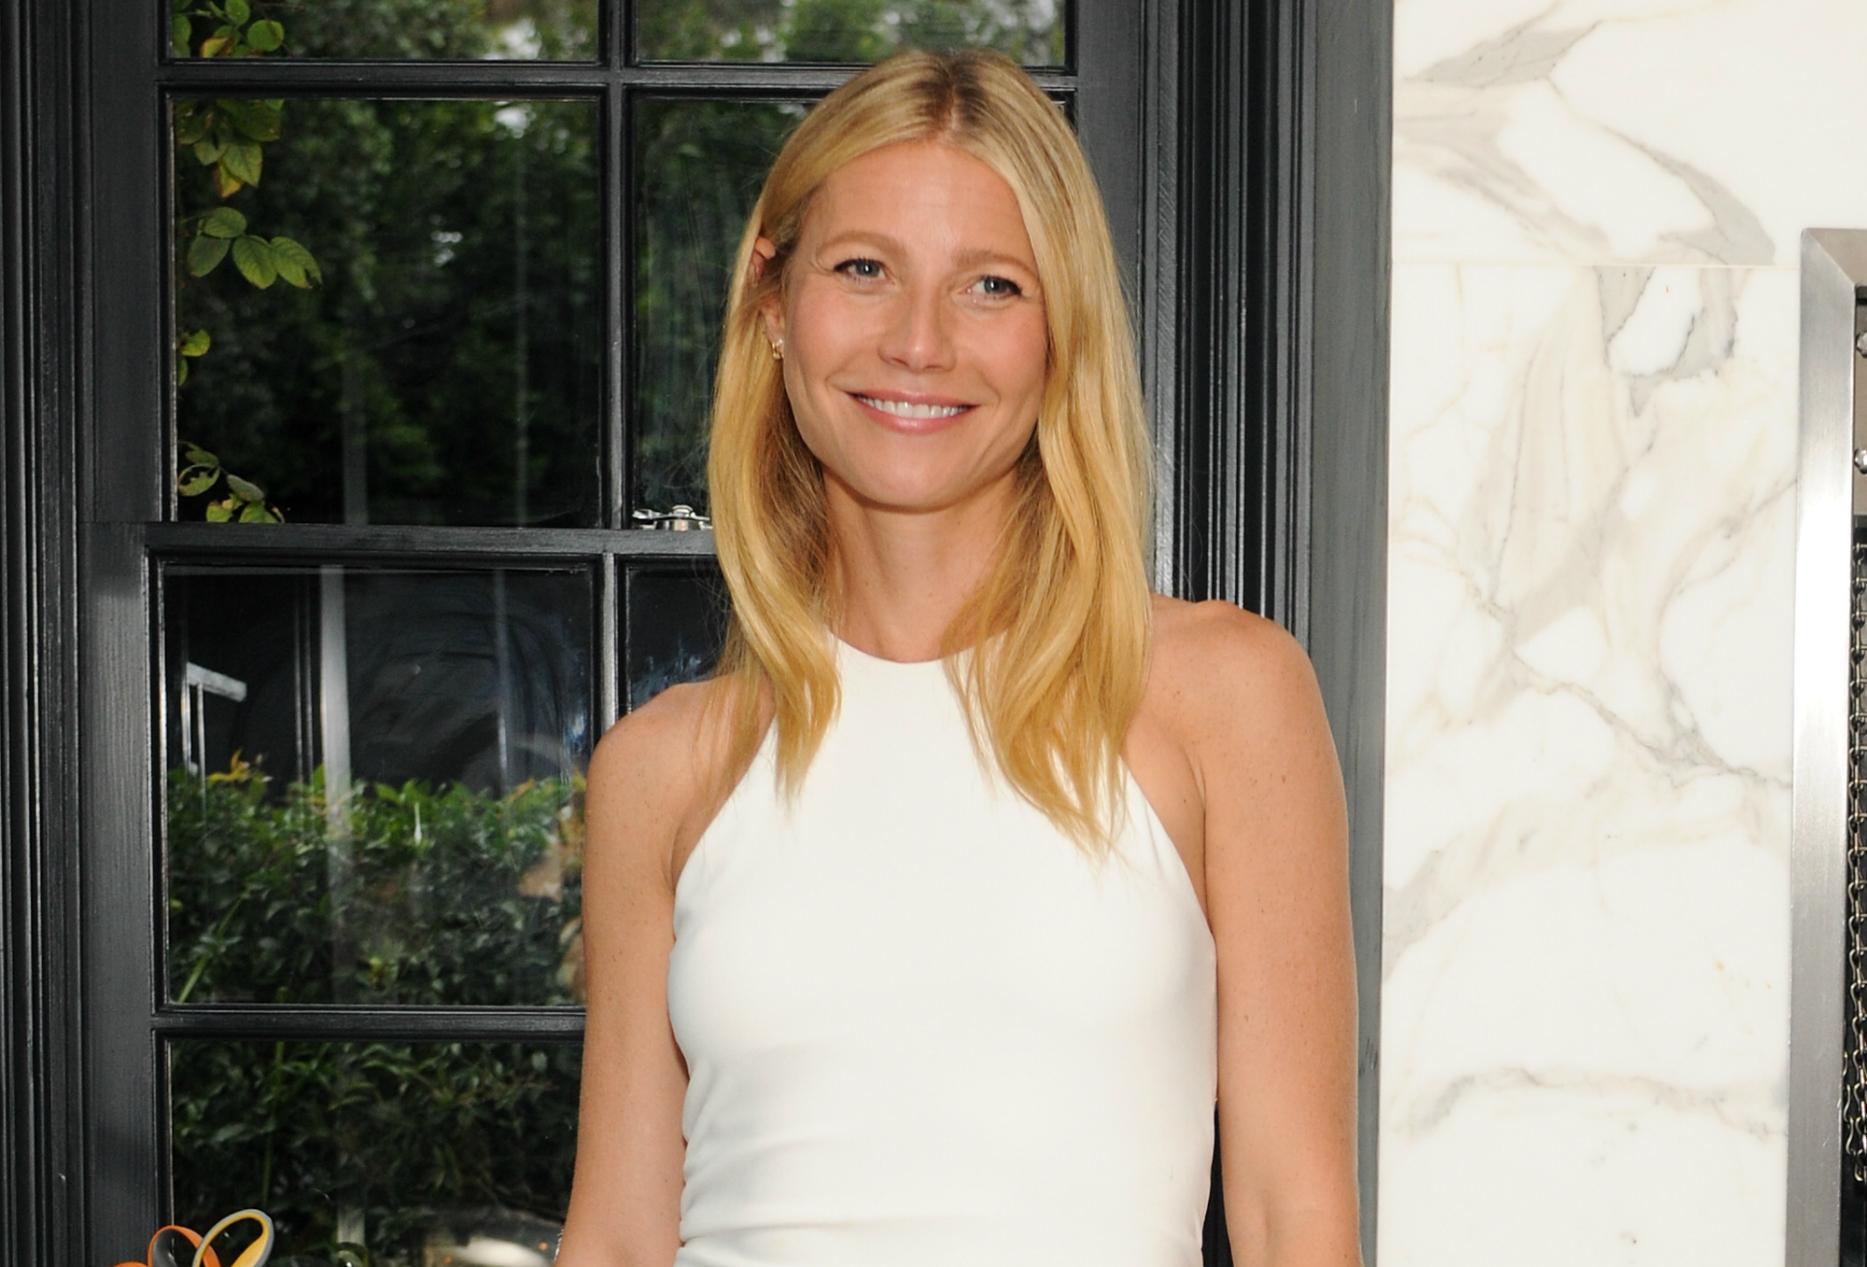 News: Gwyneth's Growing Beauty Empire Breaking Down the KardashianInfluence